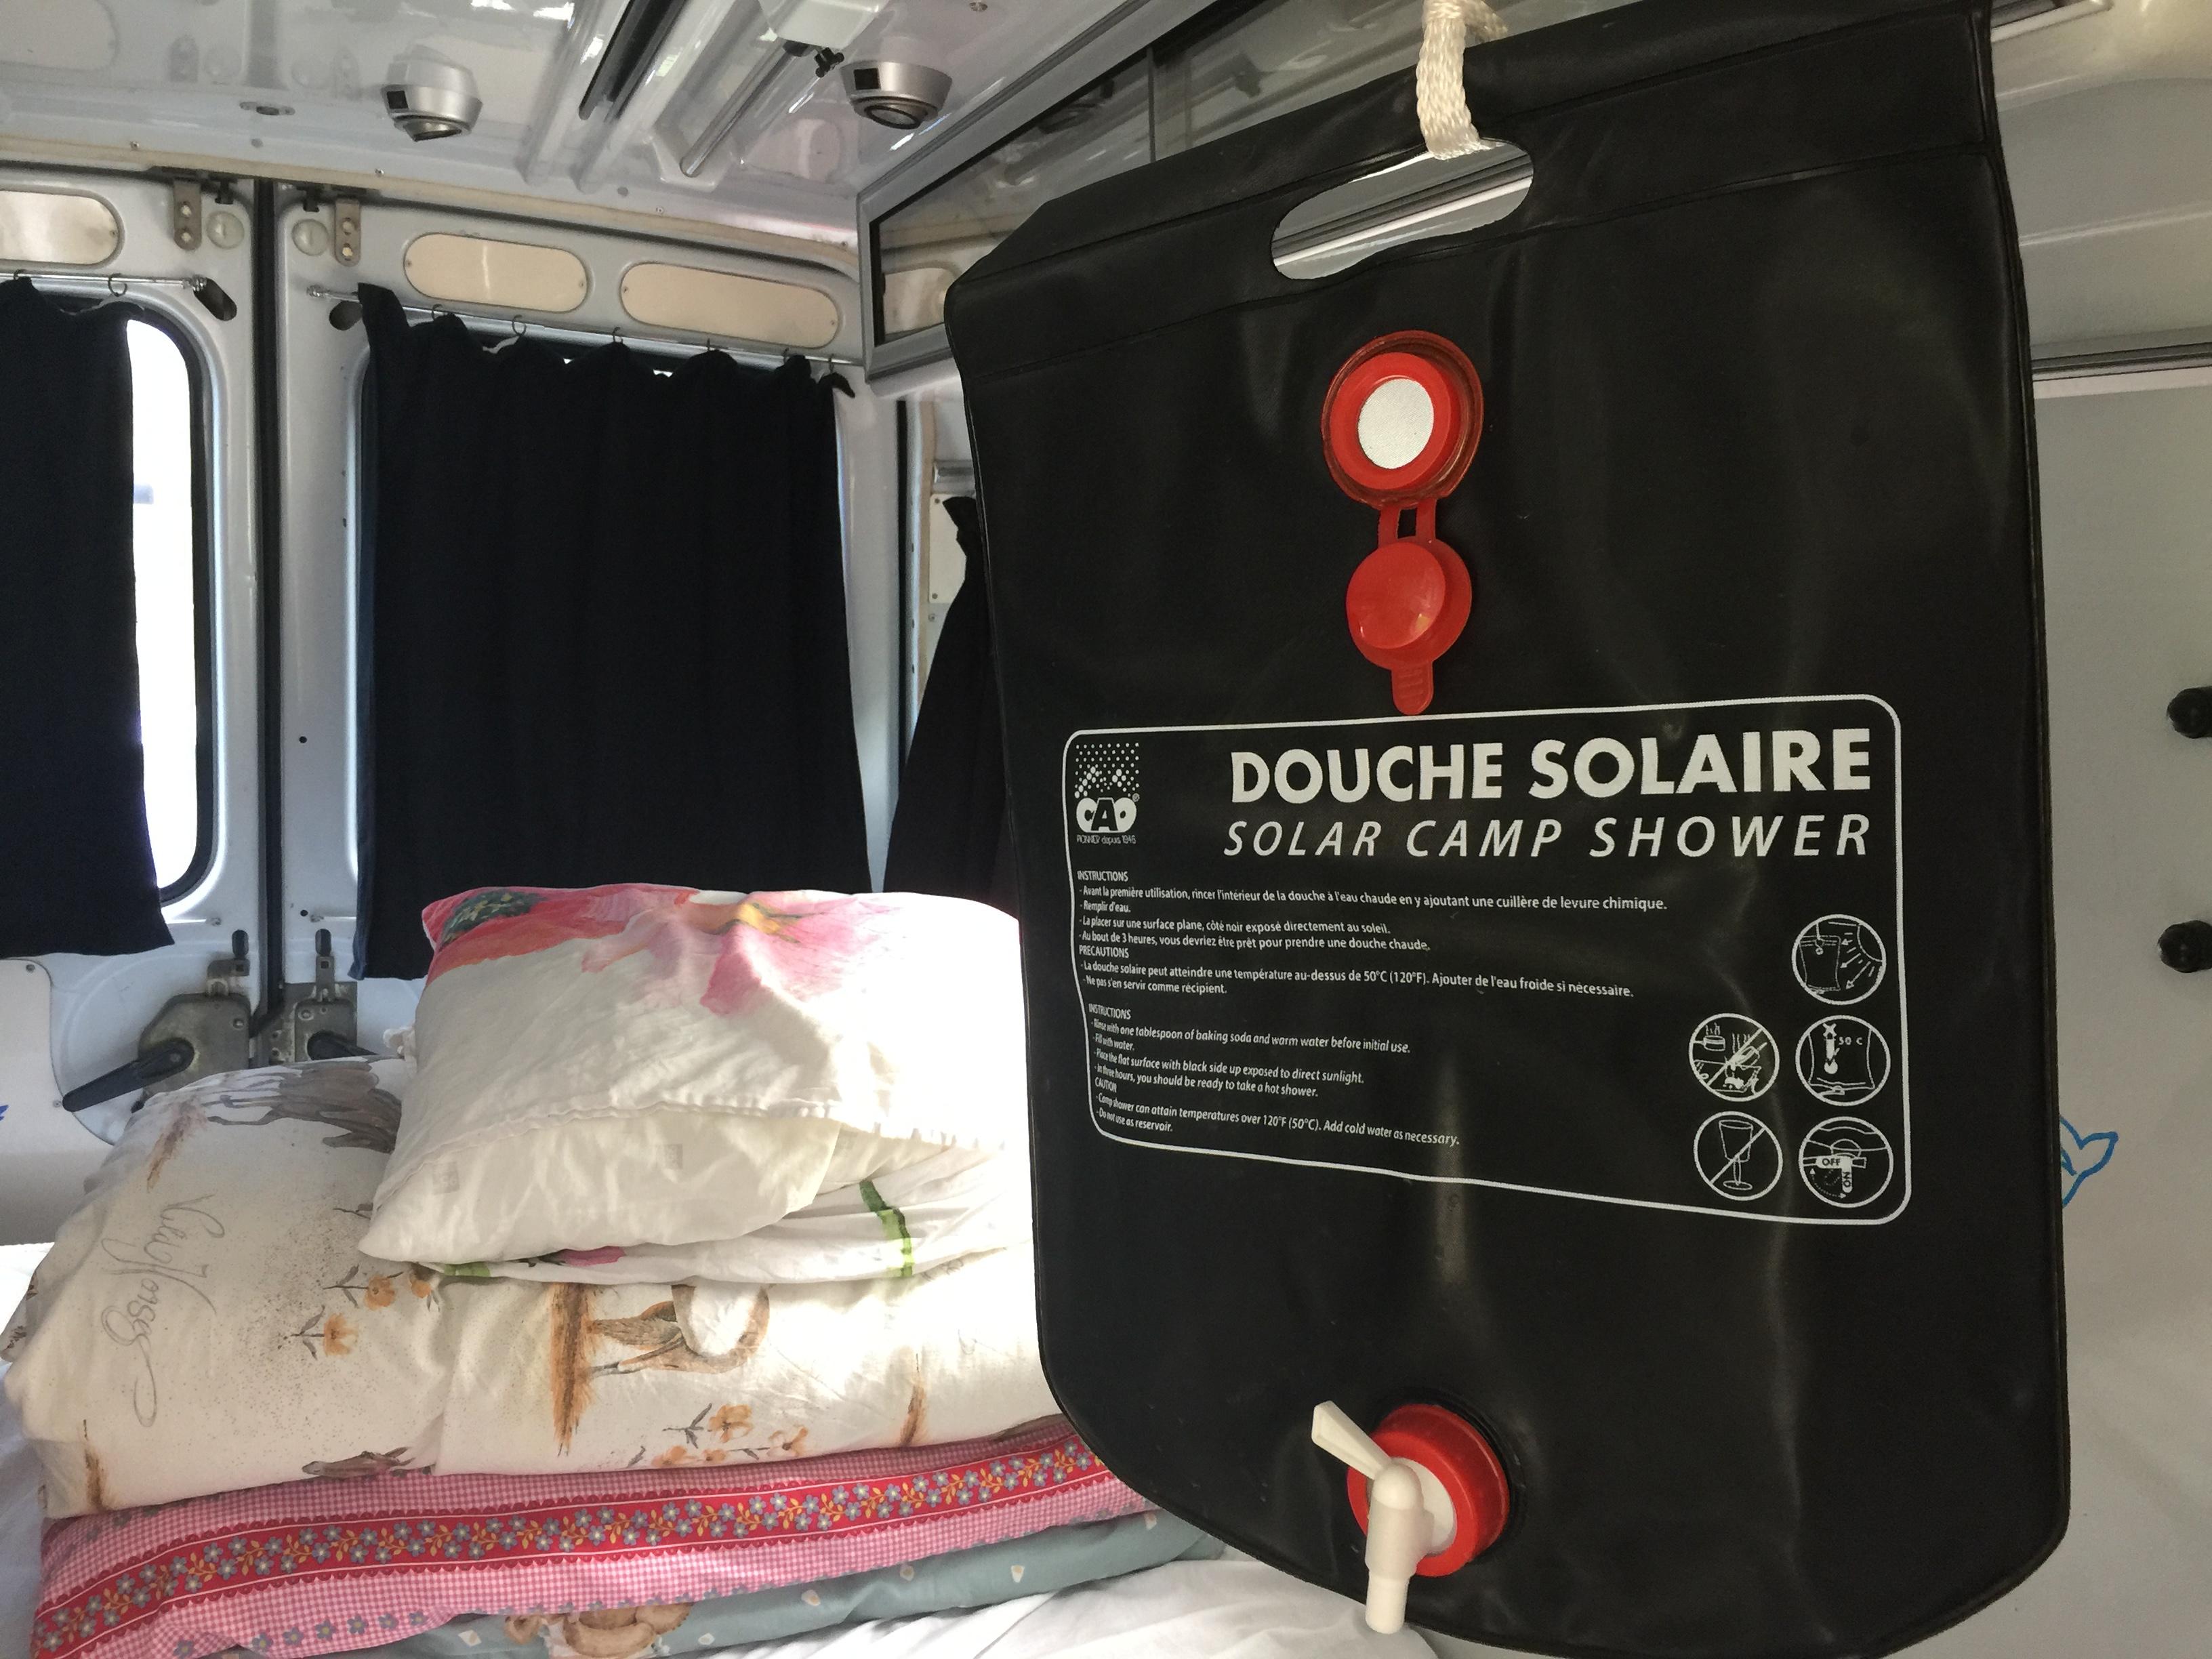 Ares Douche Solaire Camp Shower 20L